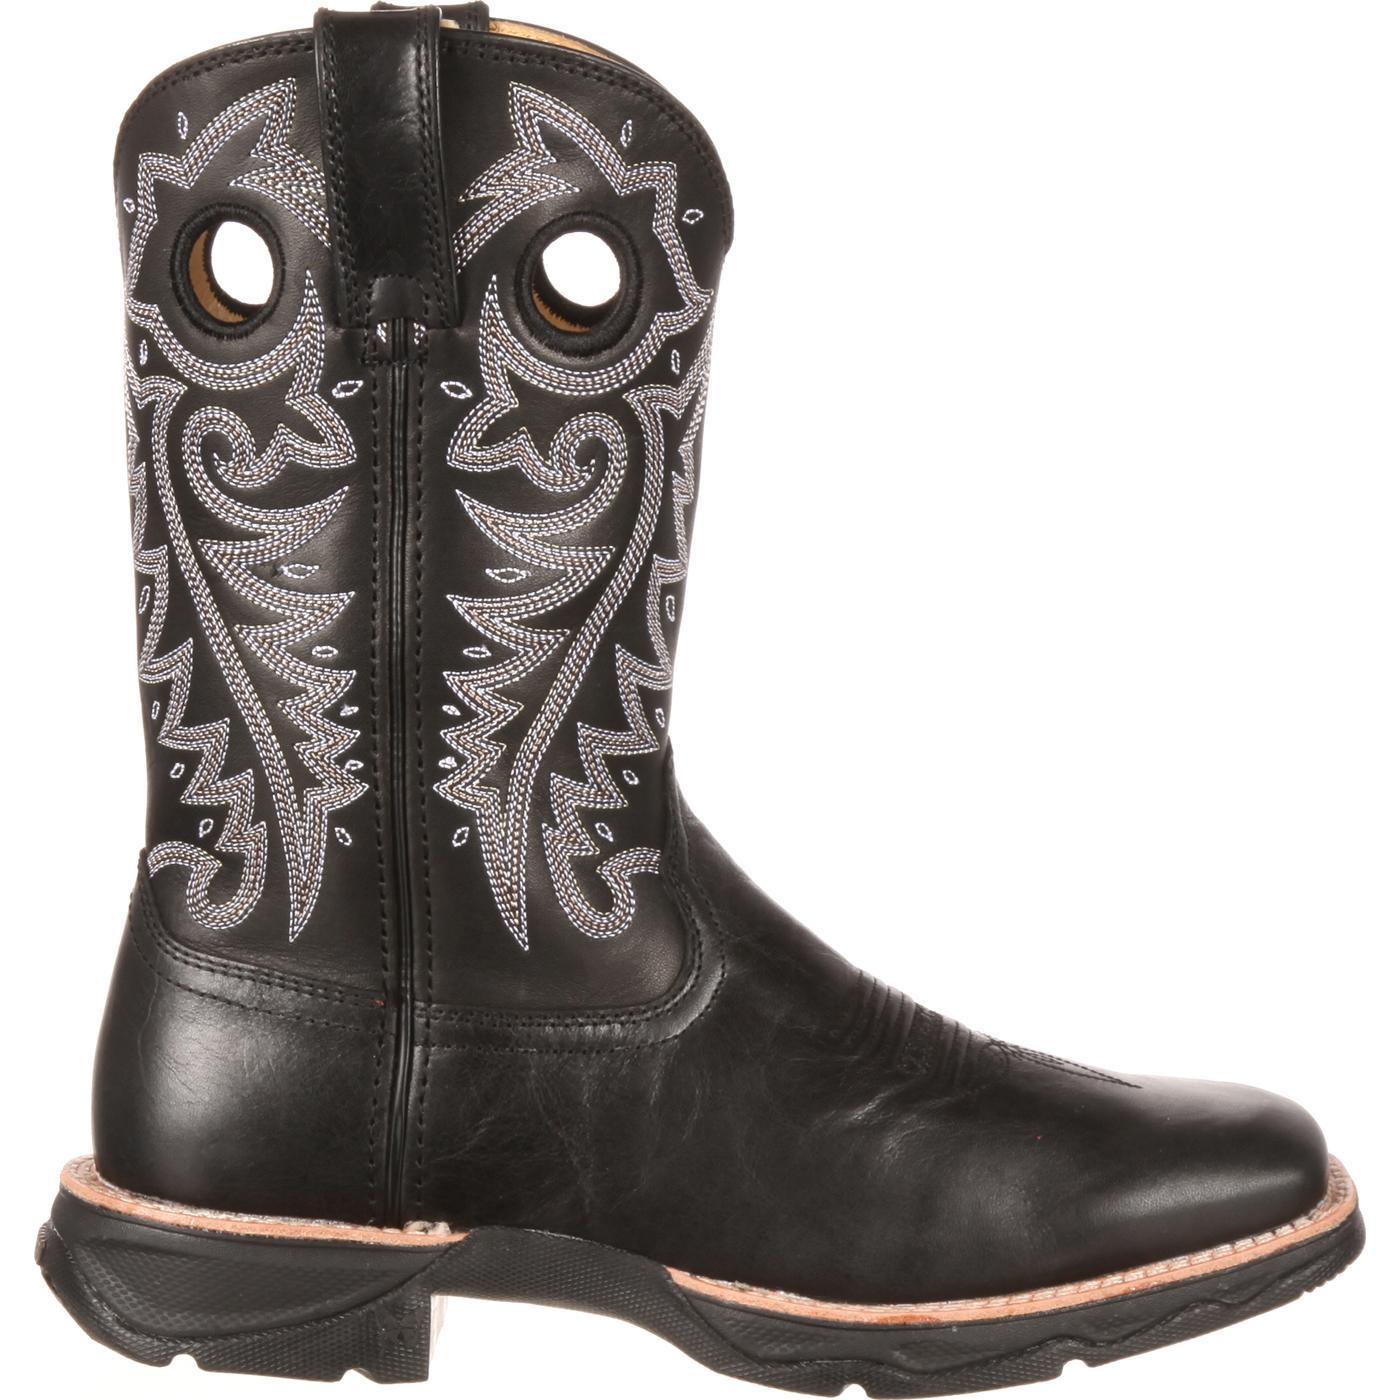 Brilliant Lady Rebel By Durango Womenu0026#39;s Western Boot # DRD0176